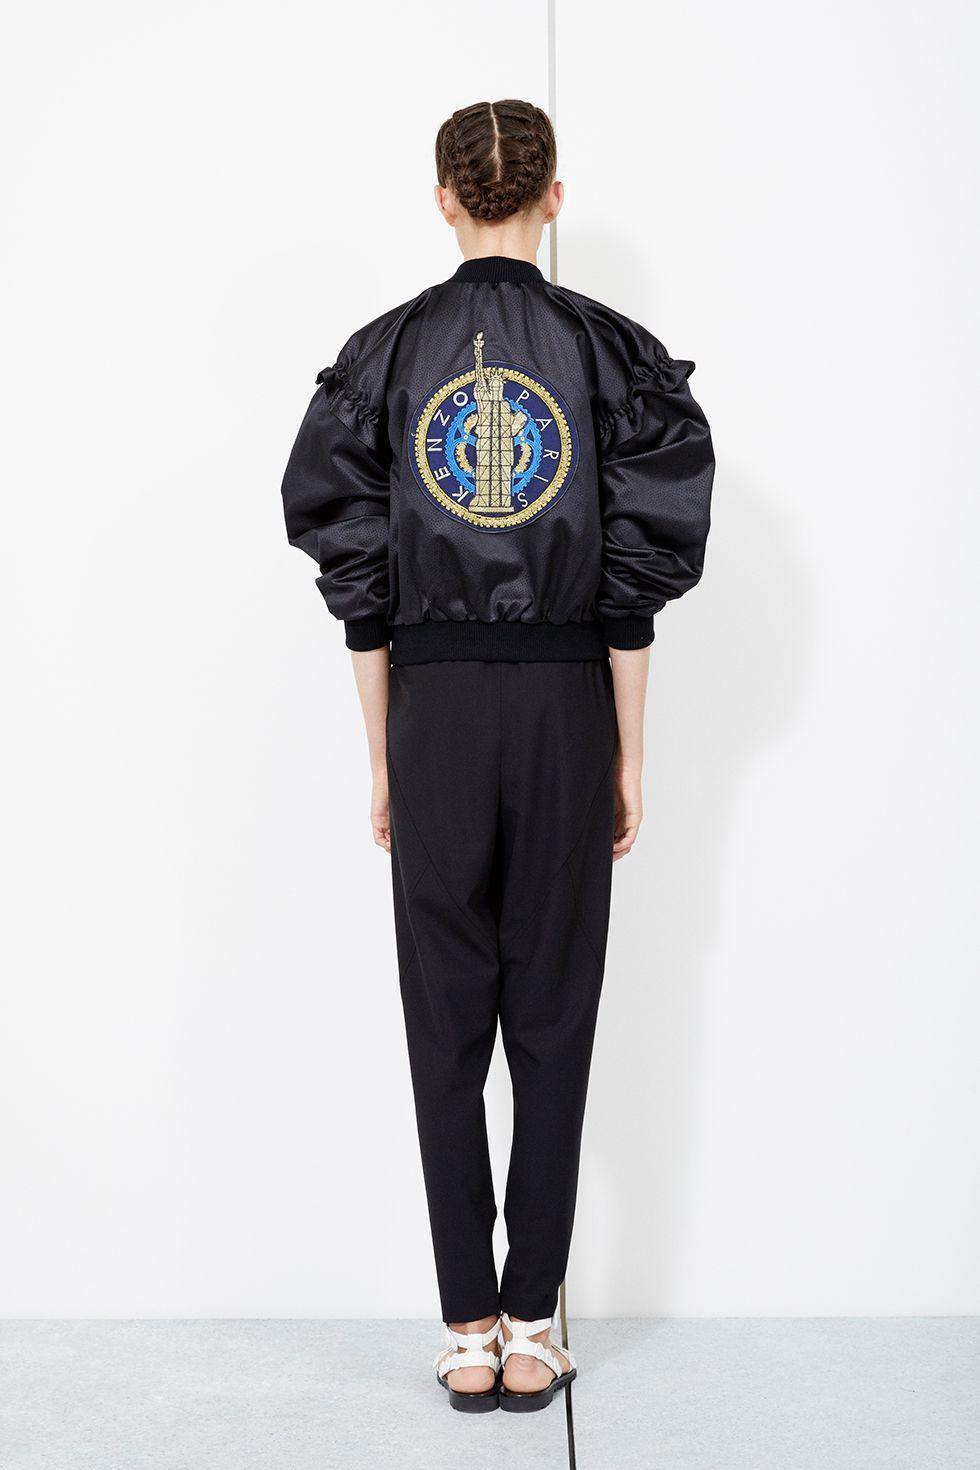 d453bcf94c Kenzo Liberty Jacket - Kenzo Coats & Jackets Women - Kenzo E-shop ...